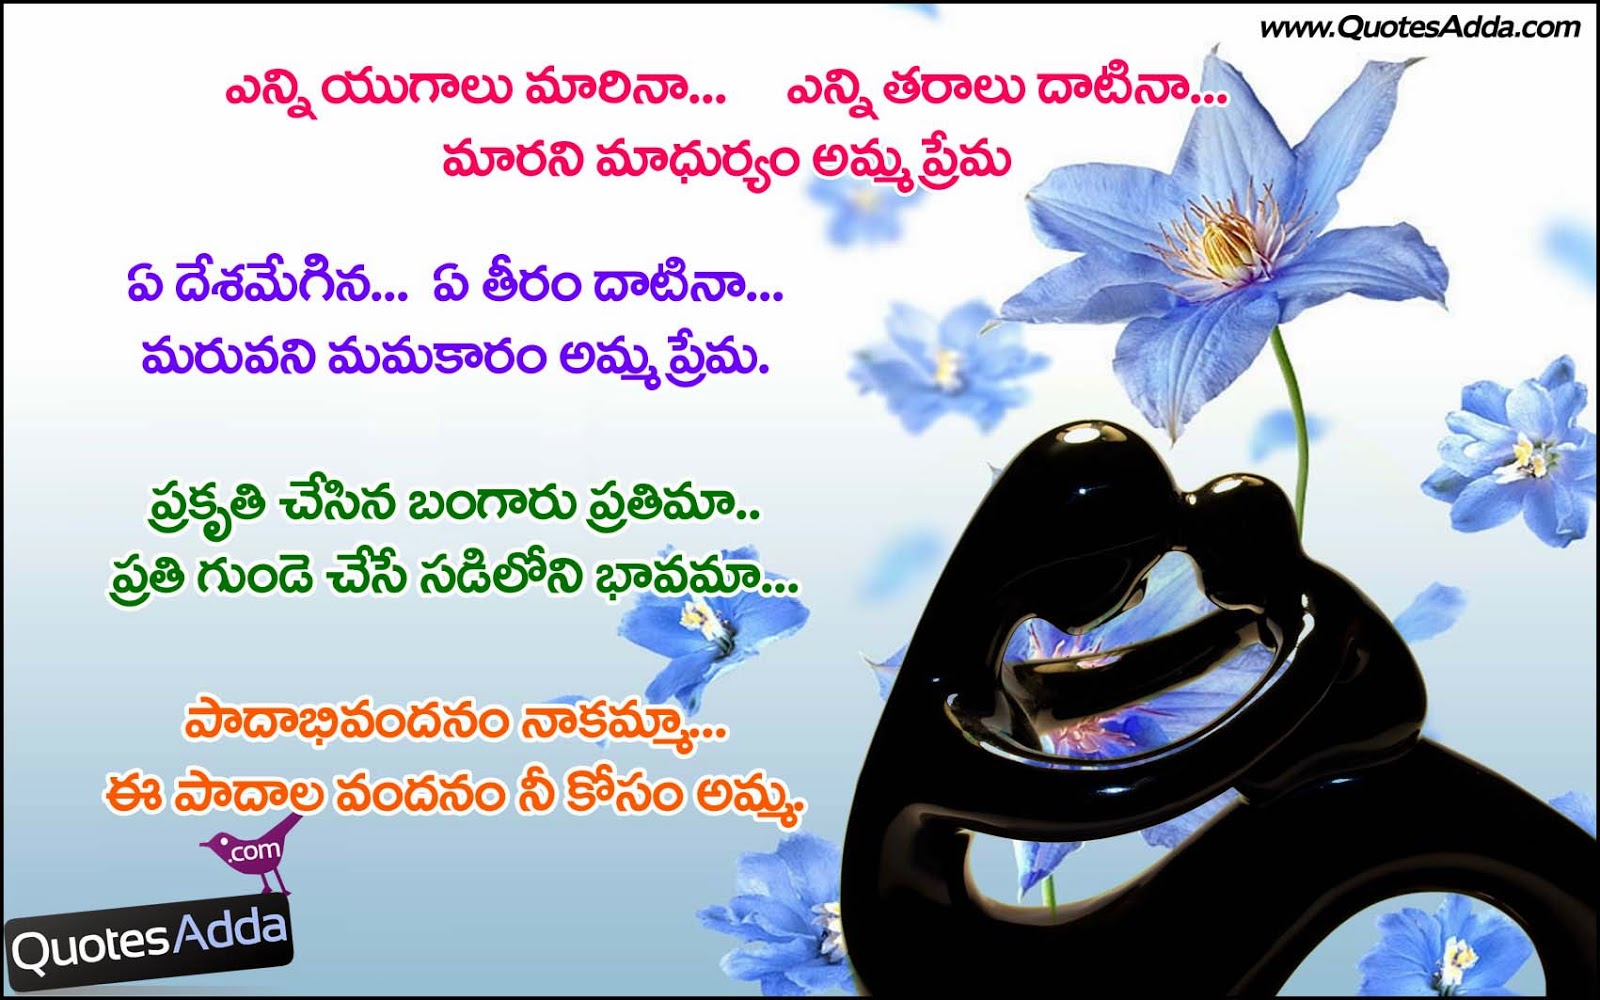 Mother+Quotes+in+Telugu++7+-+QuotesAdda.com.jpg